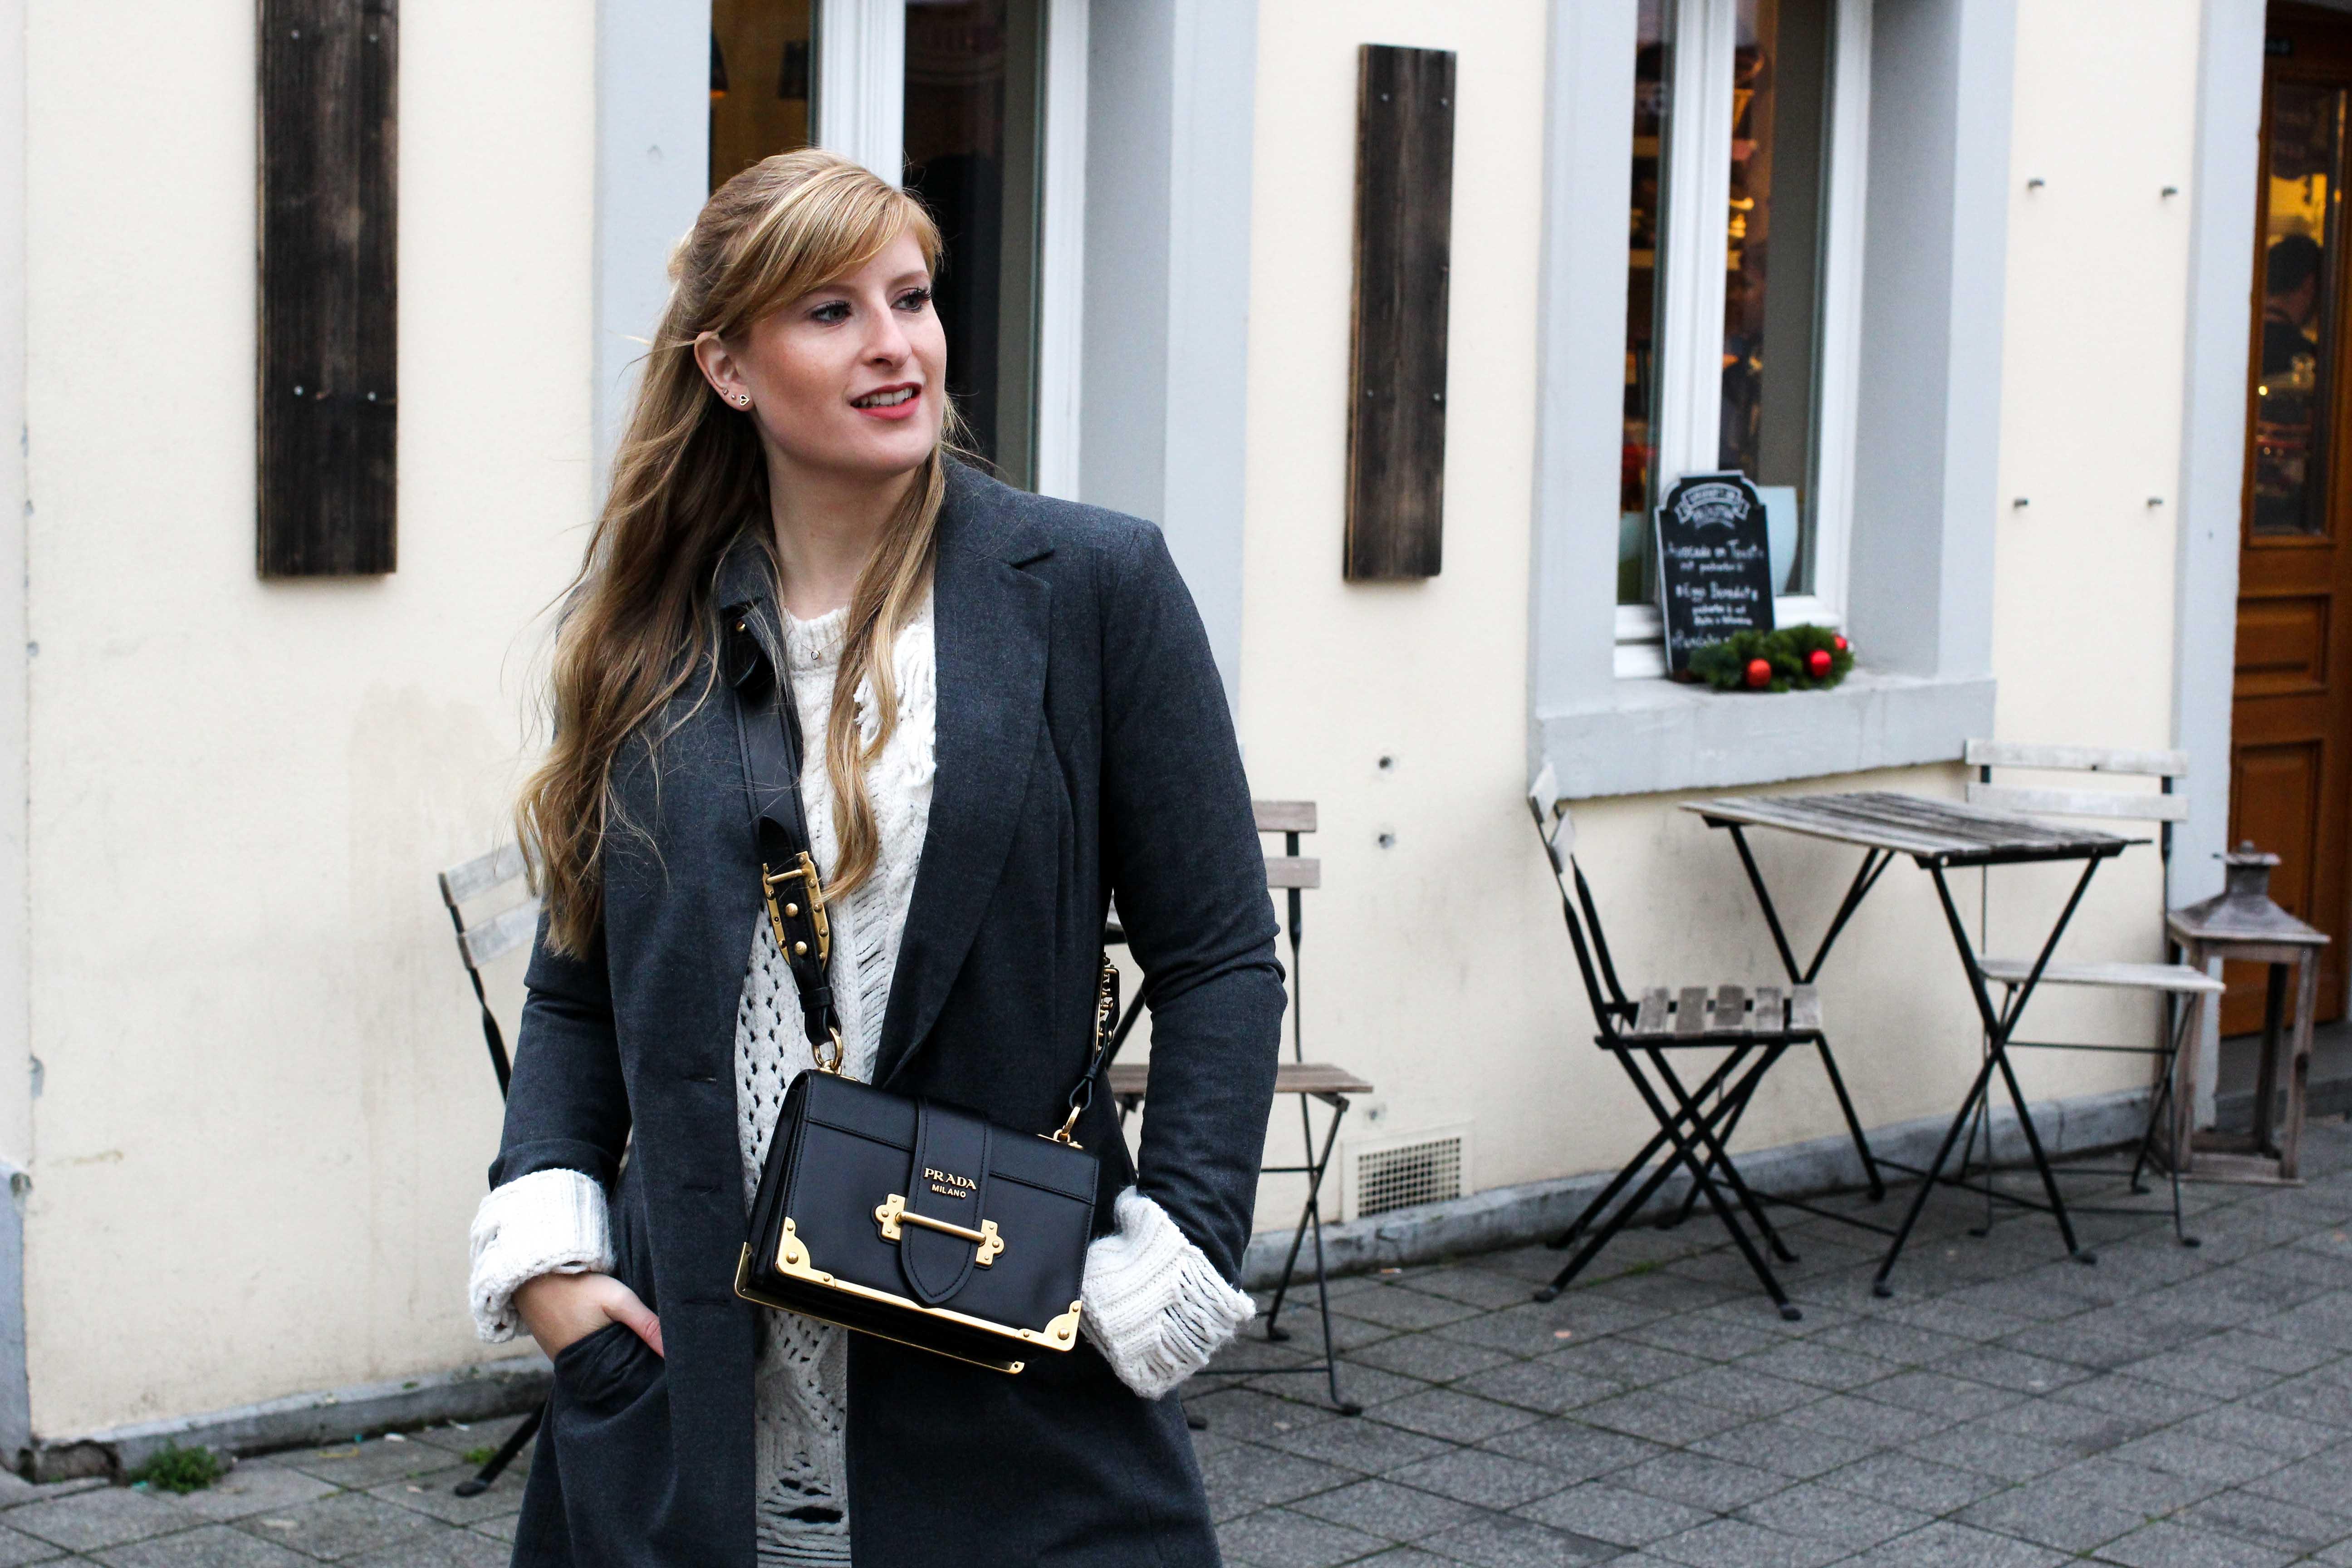 Outfit Zara Wollpullover kombinieren Streetstyle Winterlook Prada Cahier Tasche Classy Cozy Modeblog Bonn 3